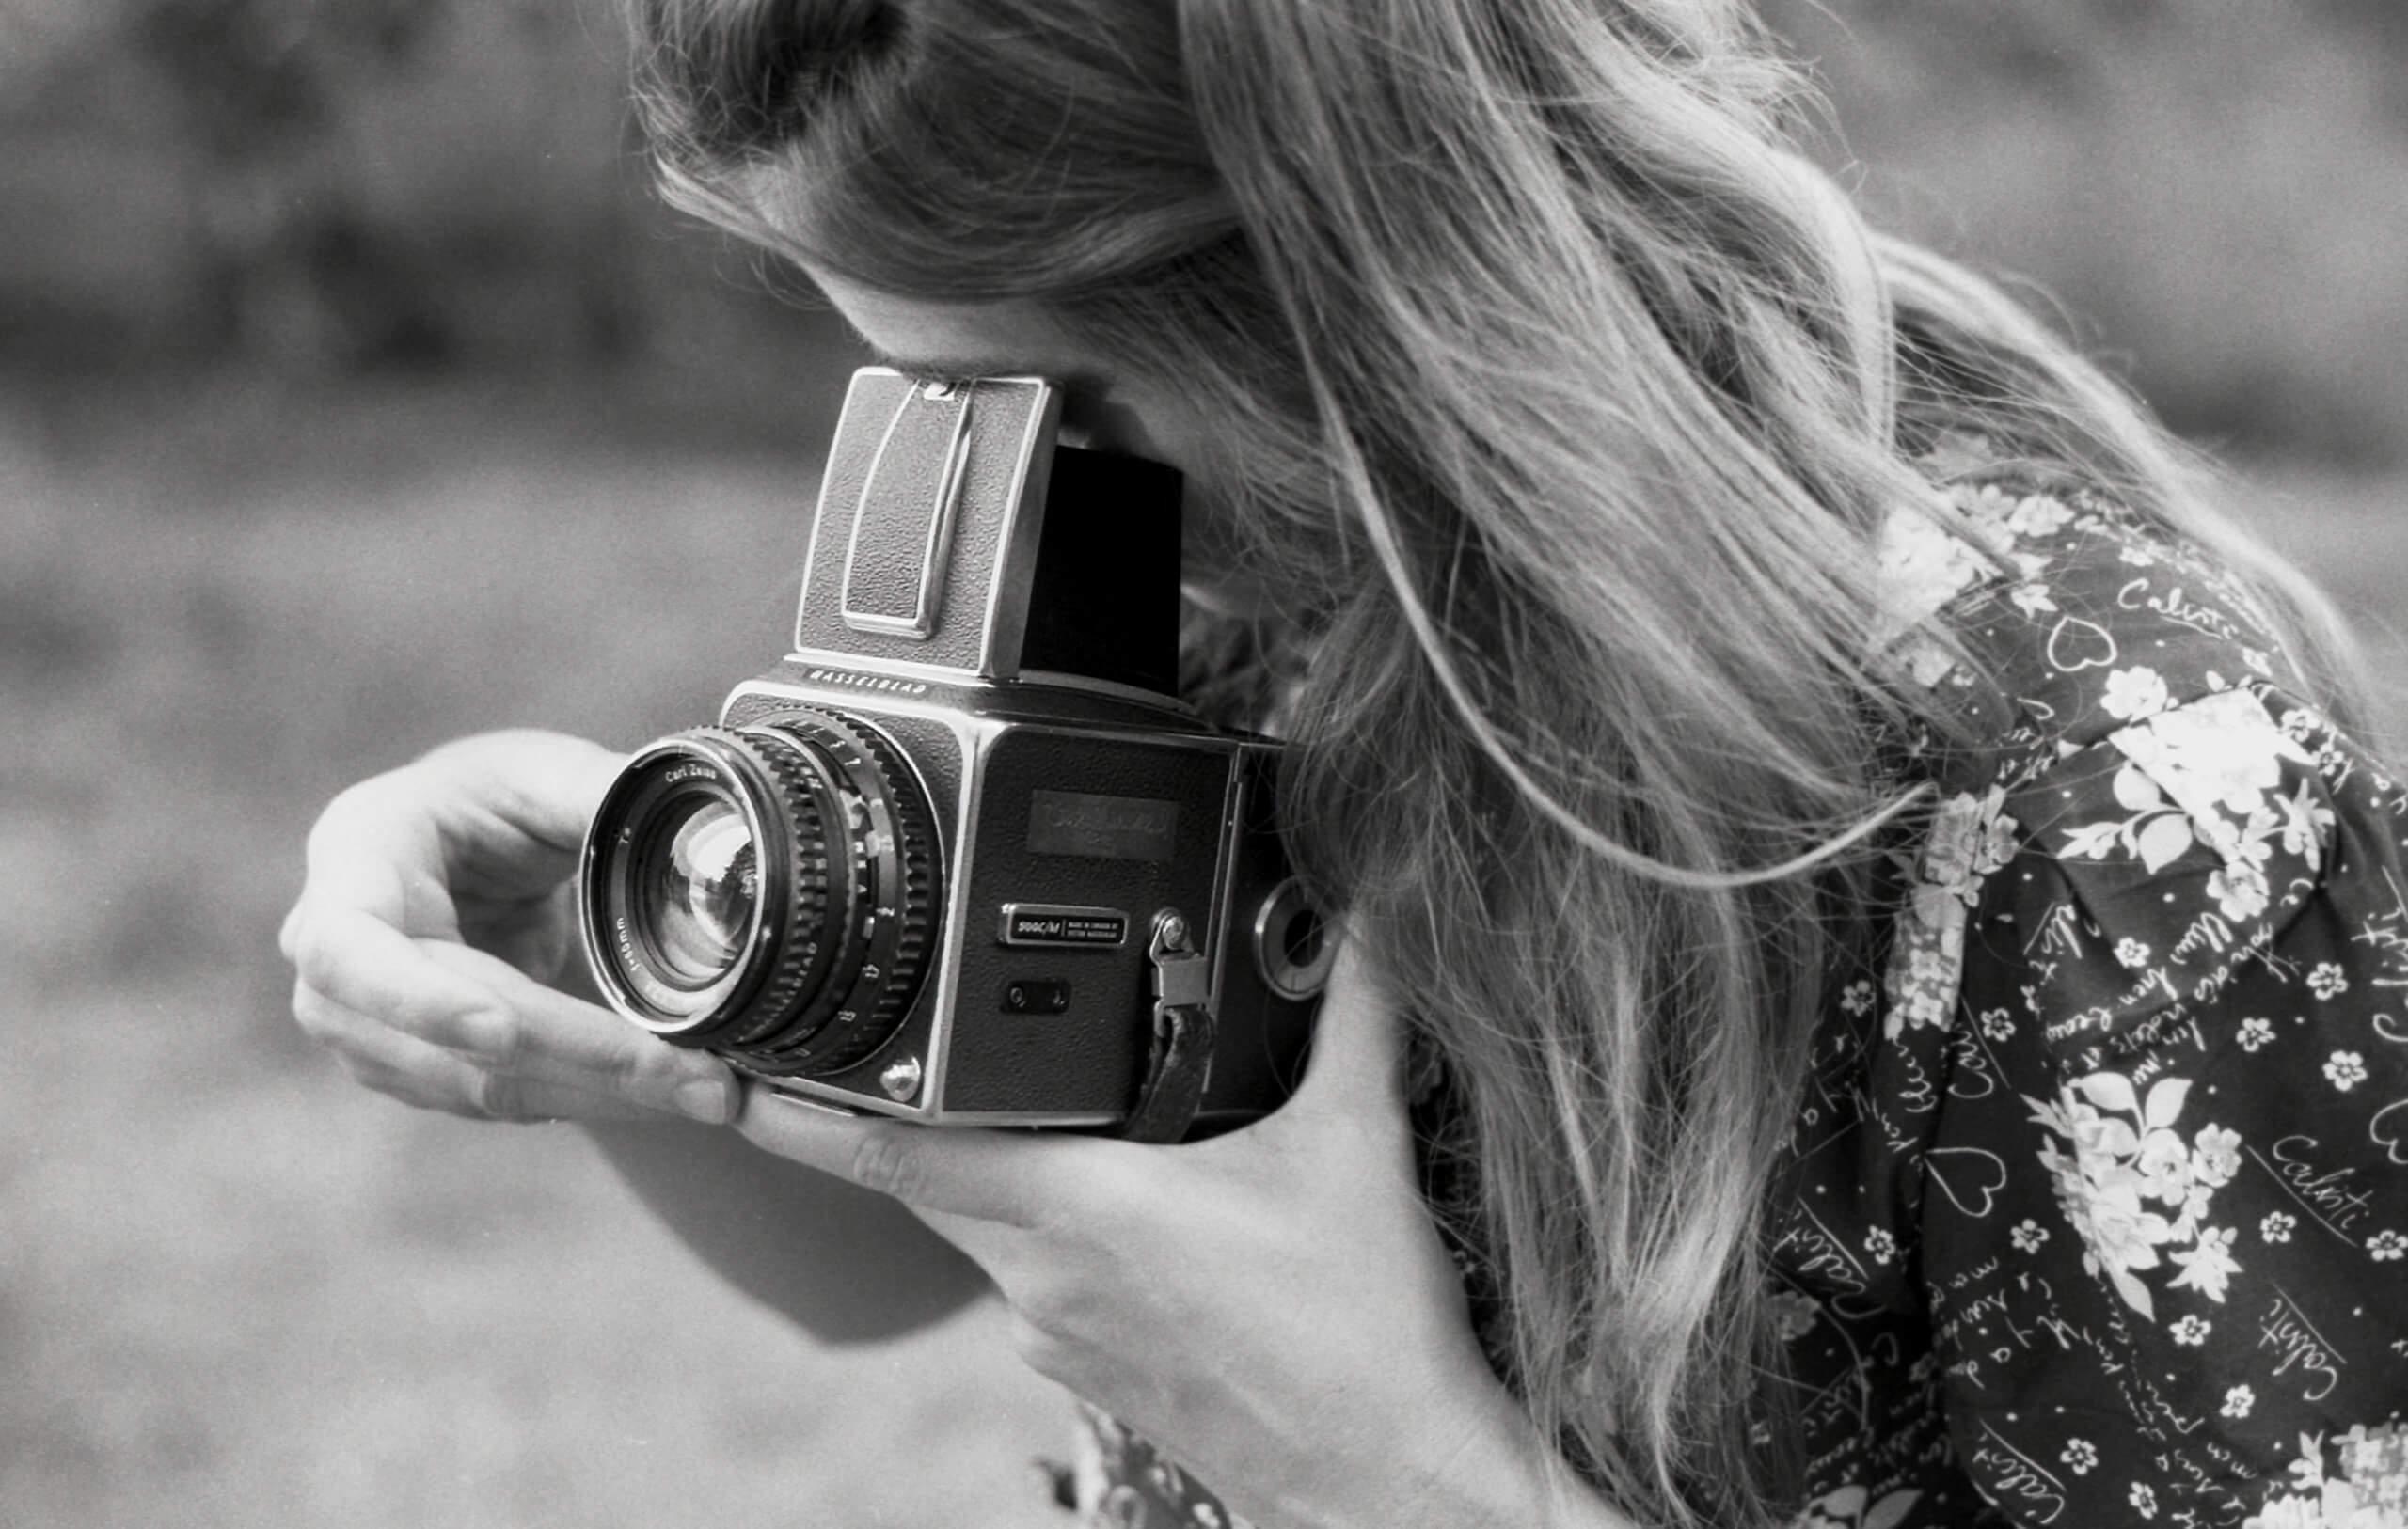 Analog hasselblad camera, black white photo